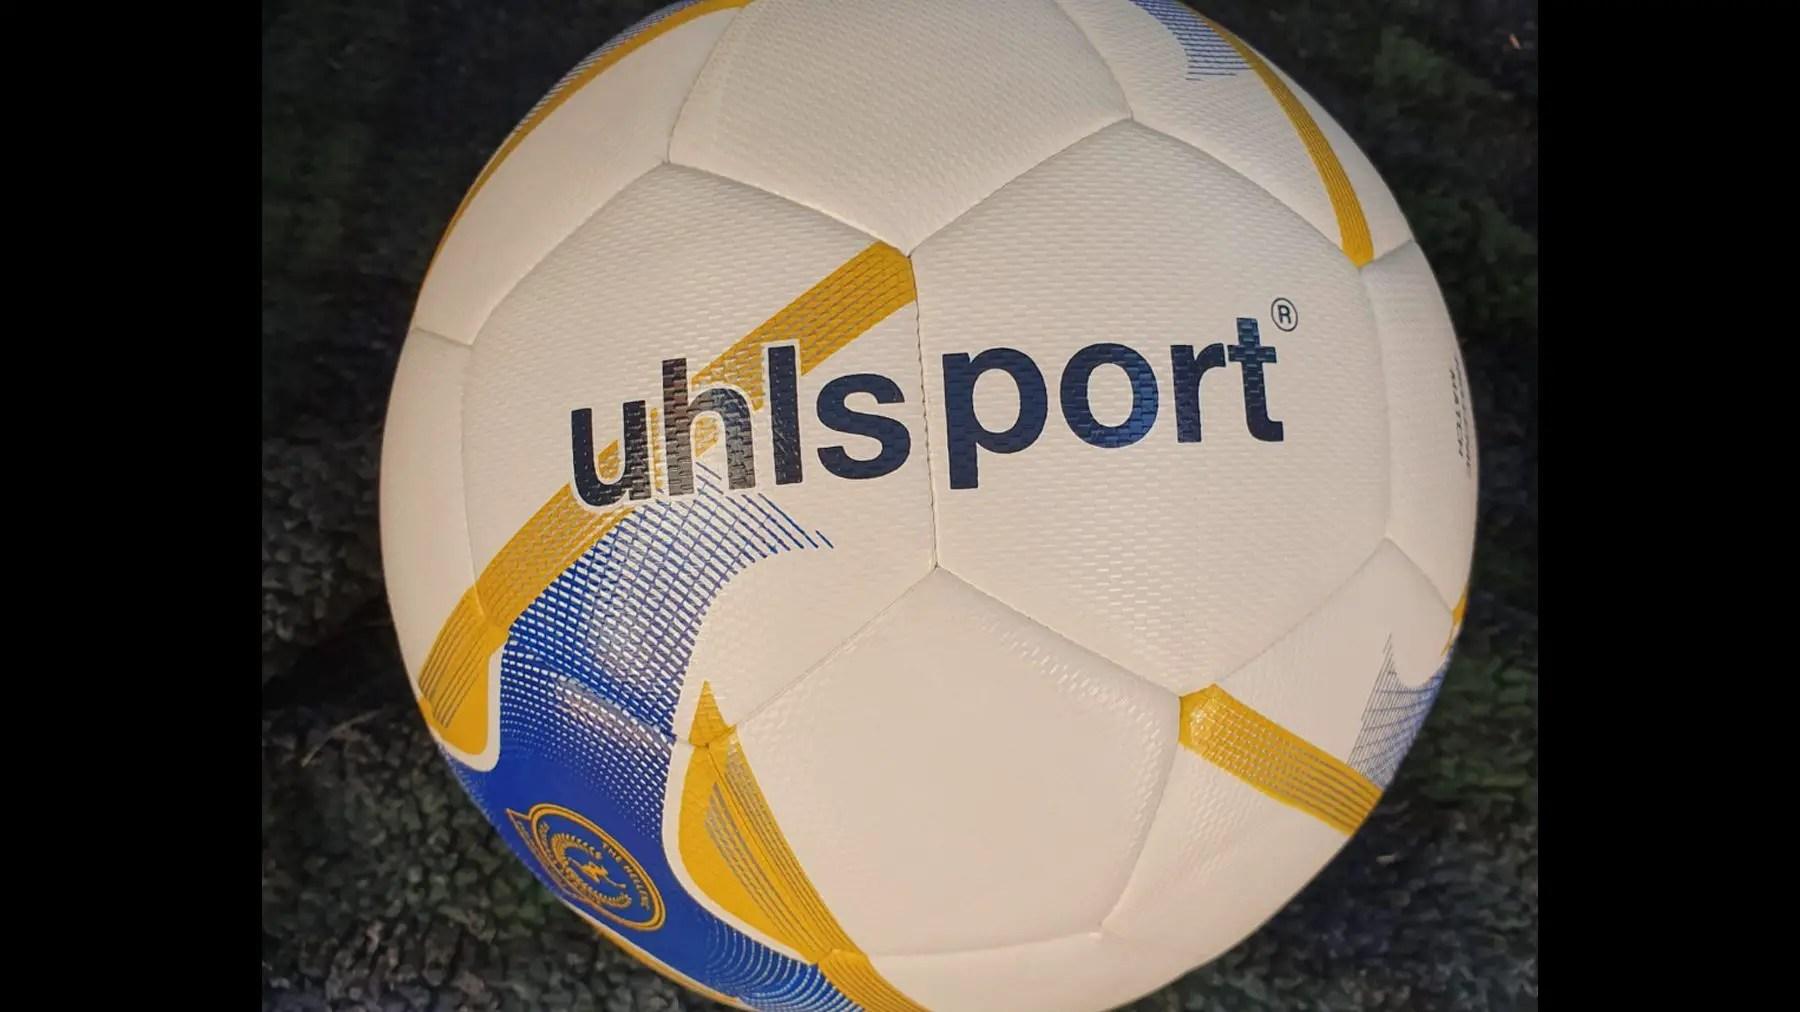 New 2019/20 Uhlsport Hellenic League football revealed